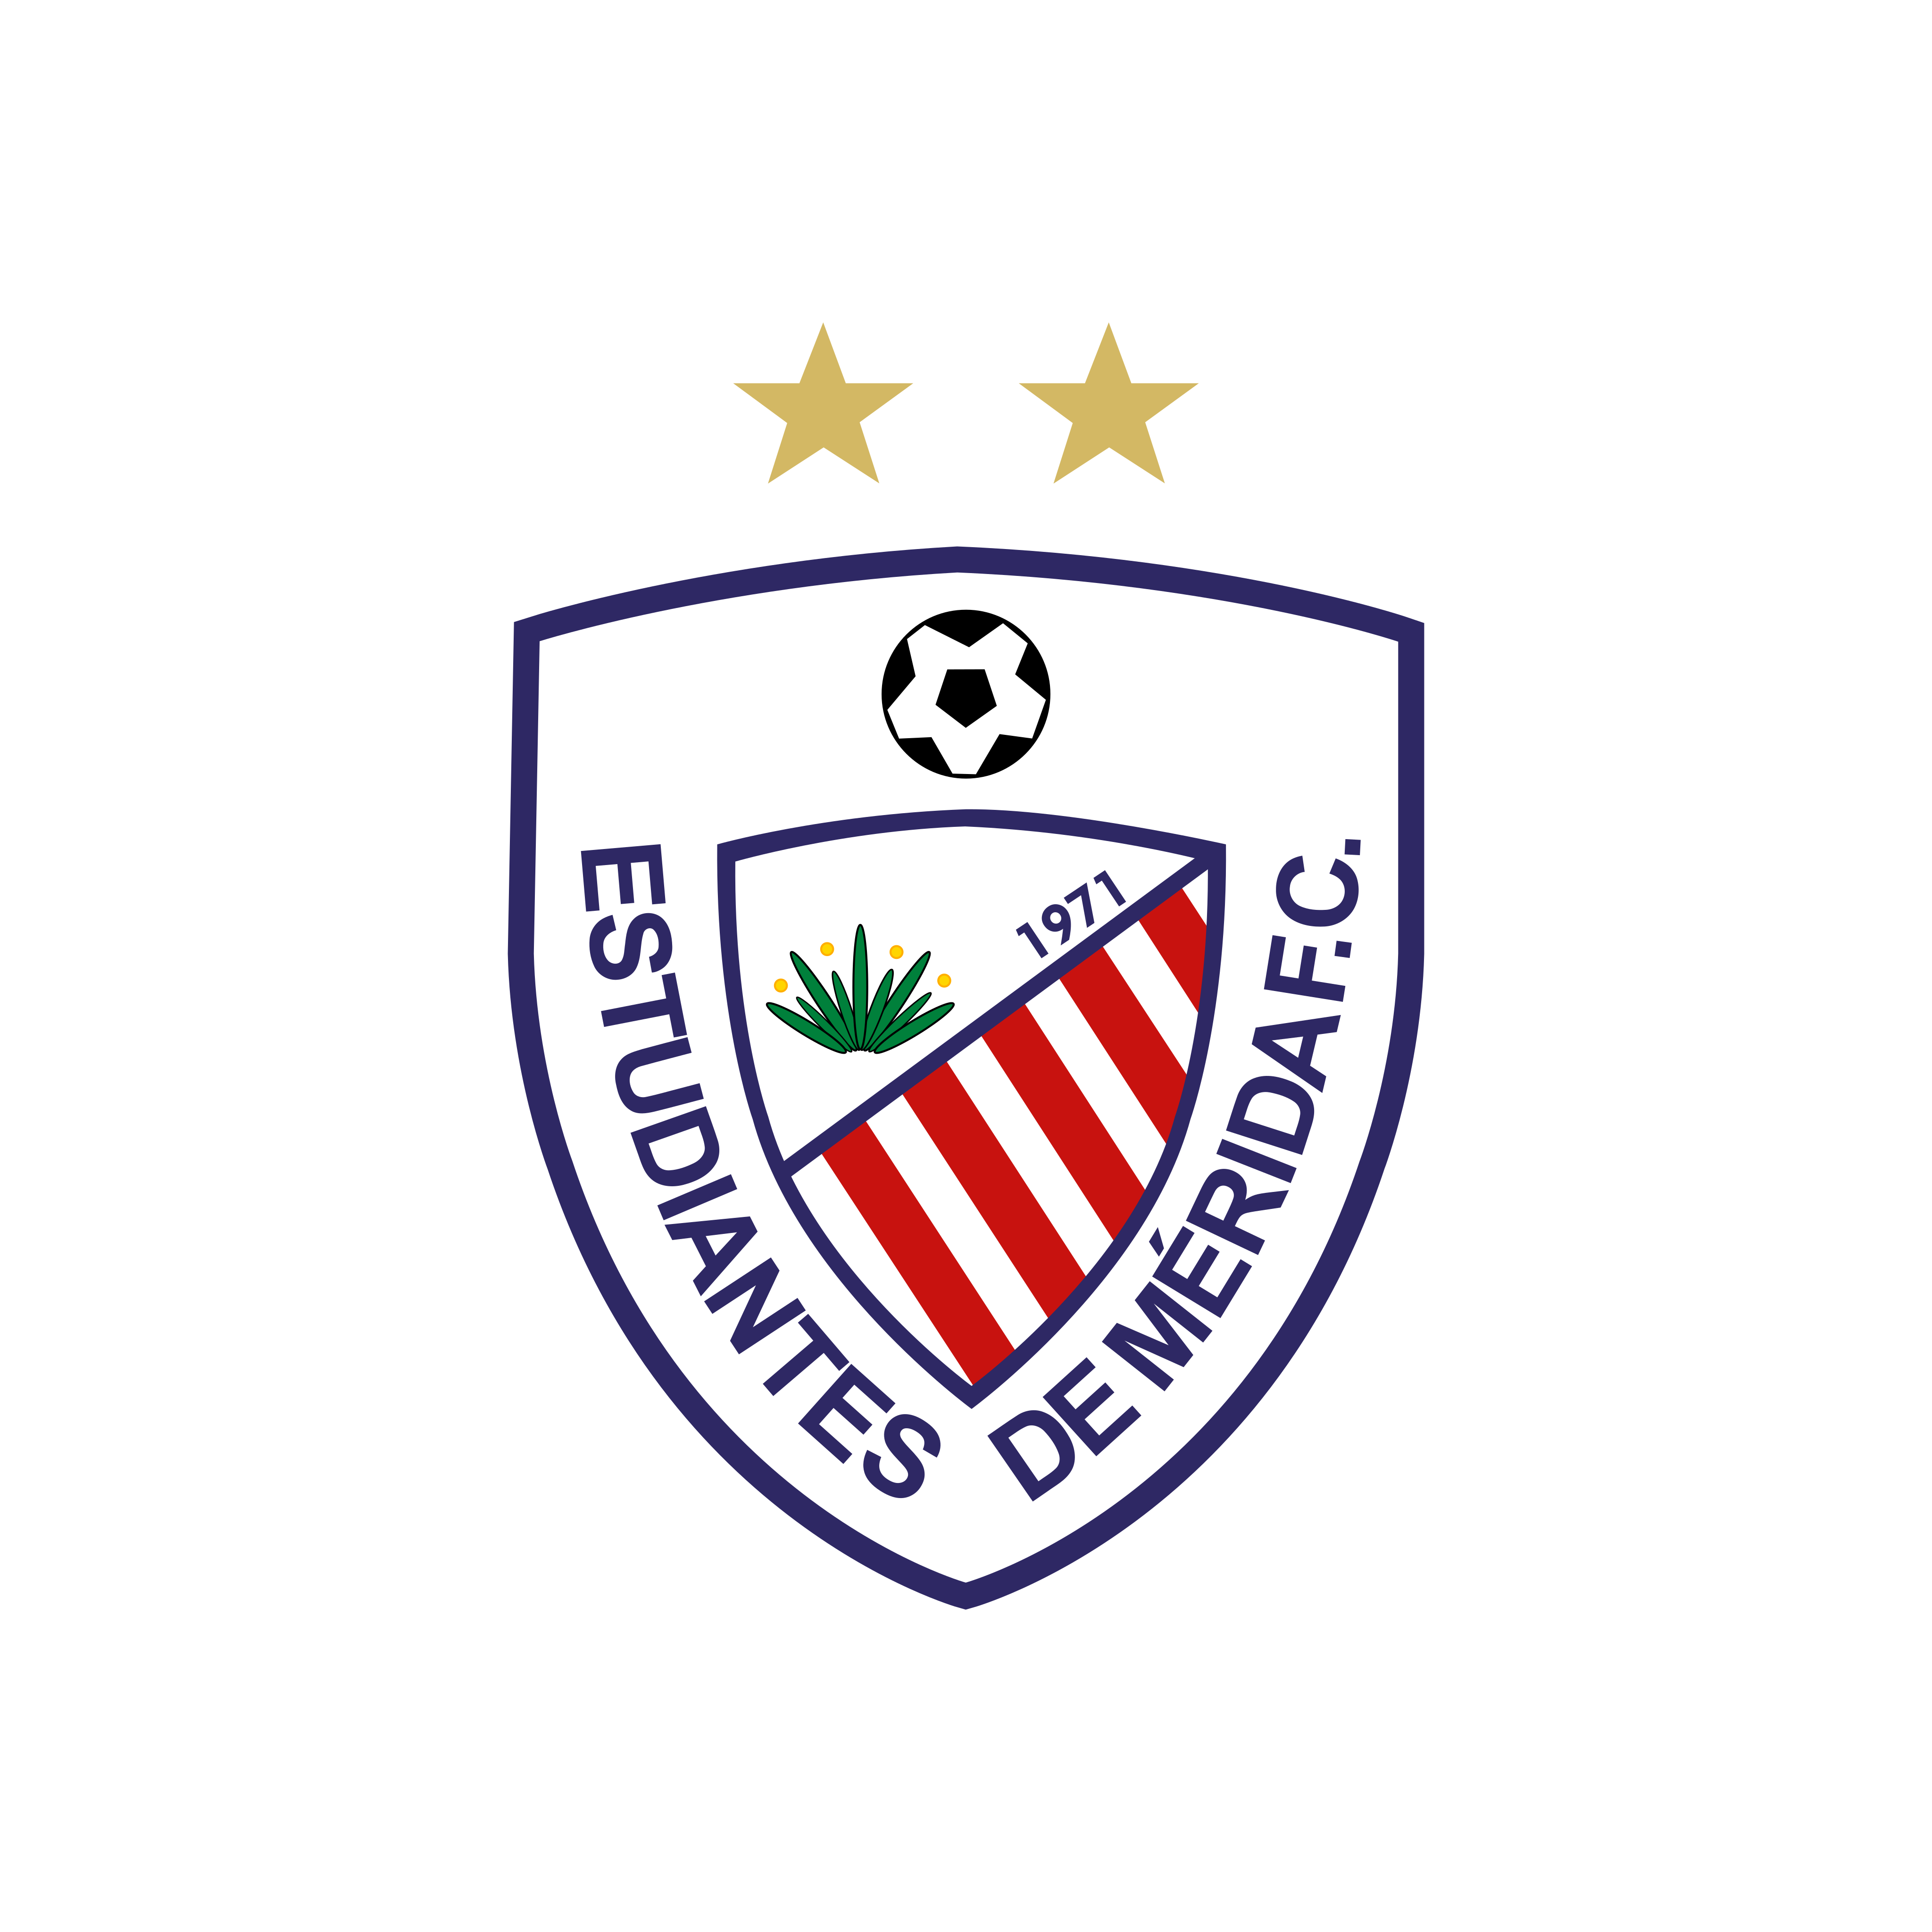 estudiantes de merida logo 0 - Estudiantes de Mérida Logo